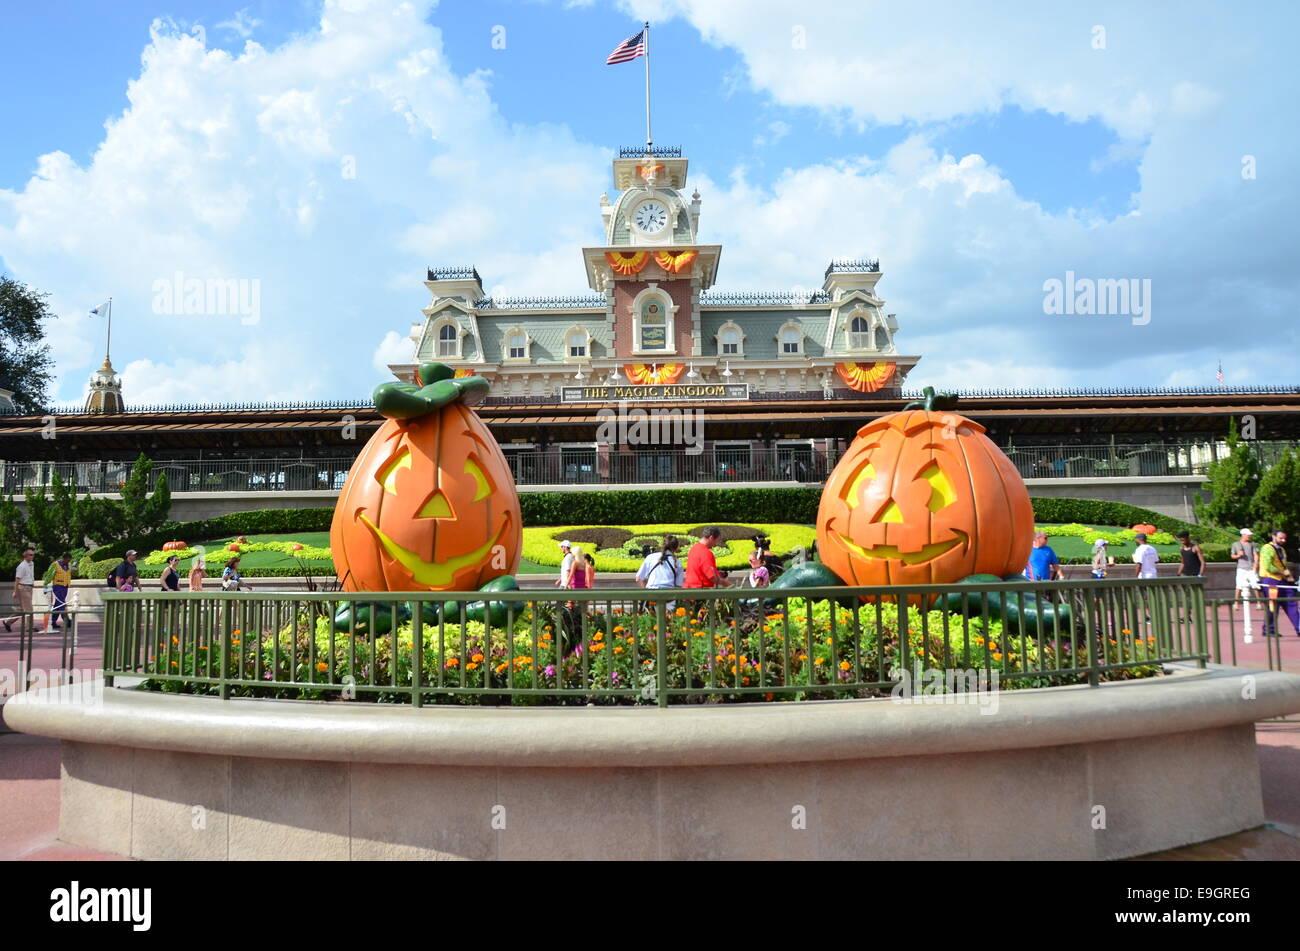 pumpkin decorations for halloween at disneys magic kingdomorlando florida - Disney Halloween Orlando